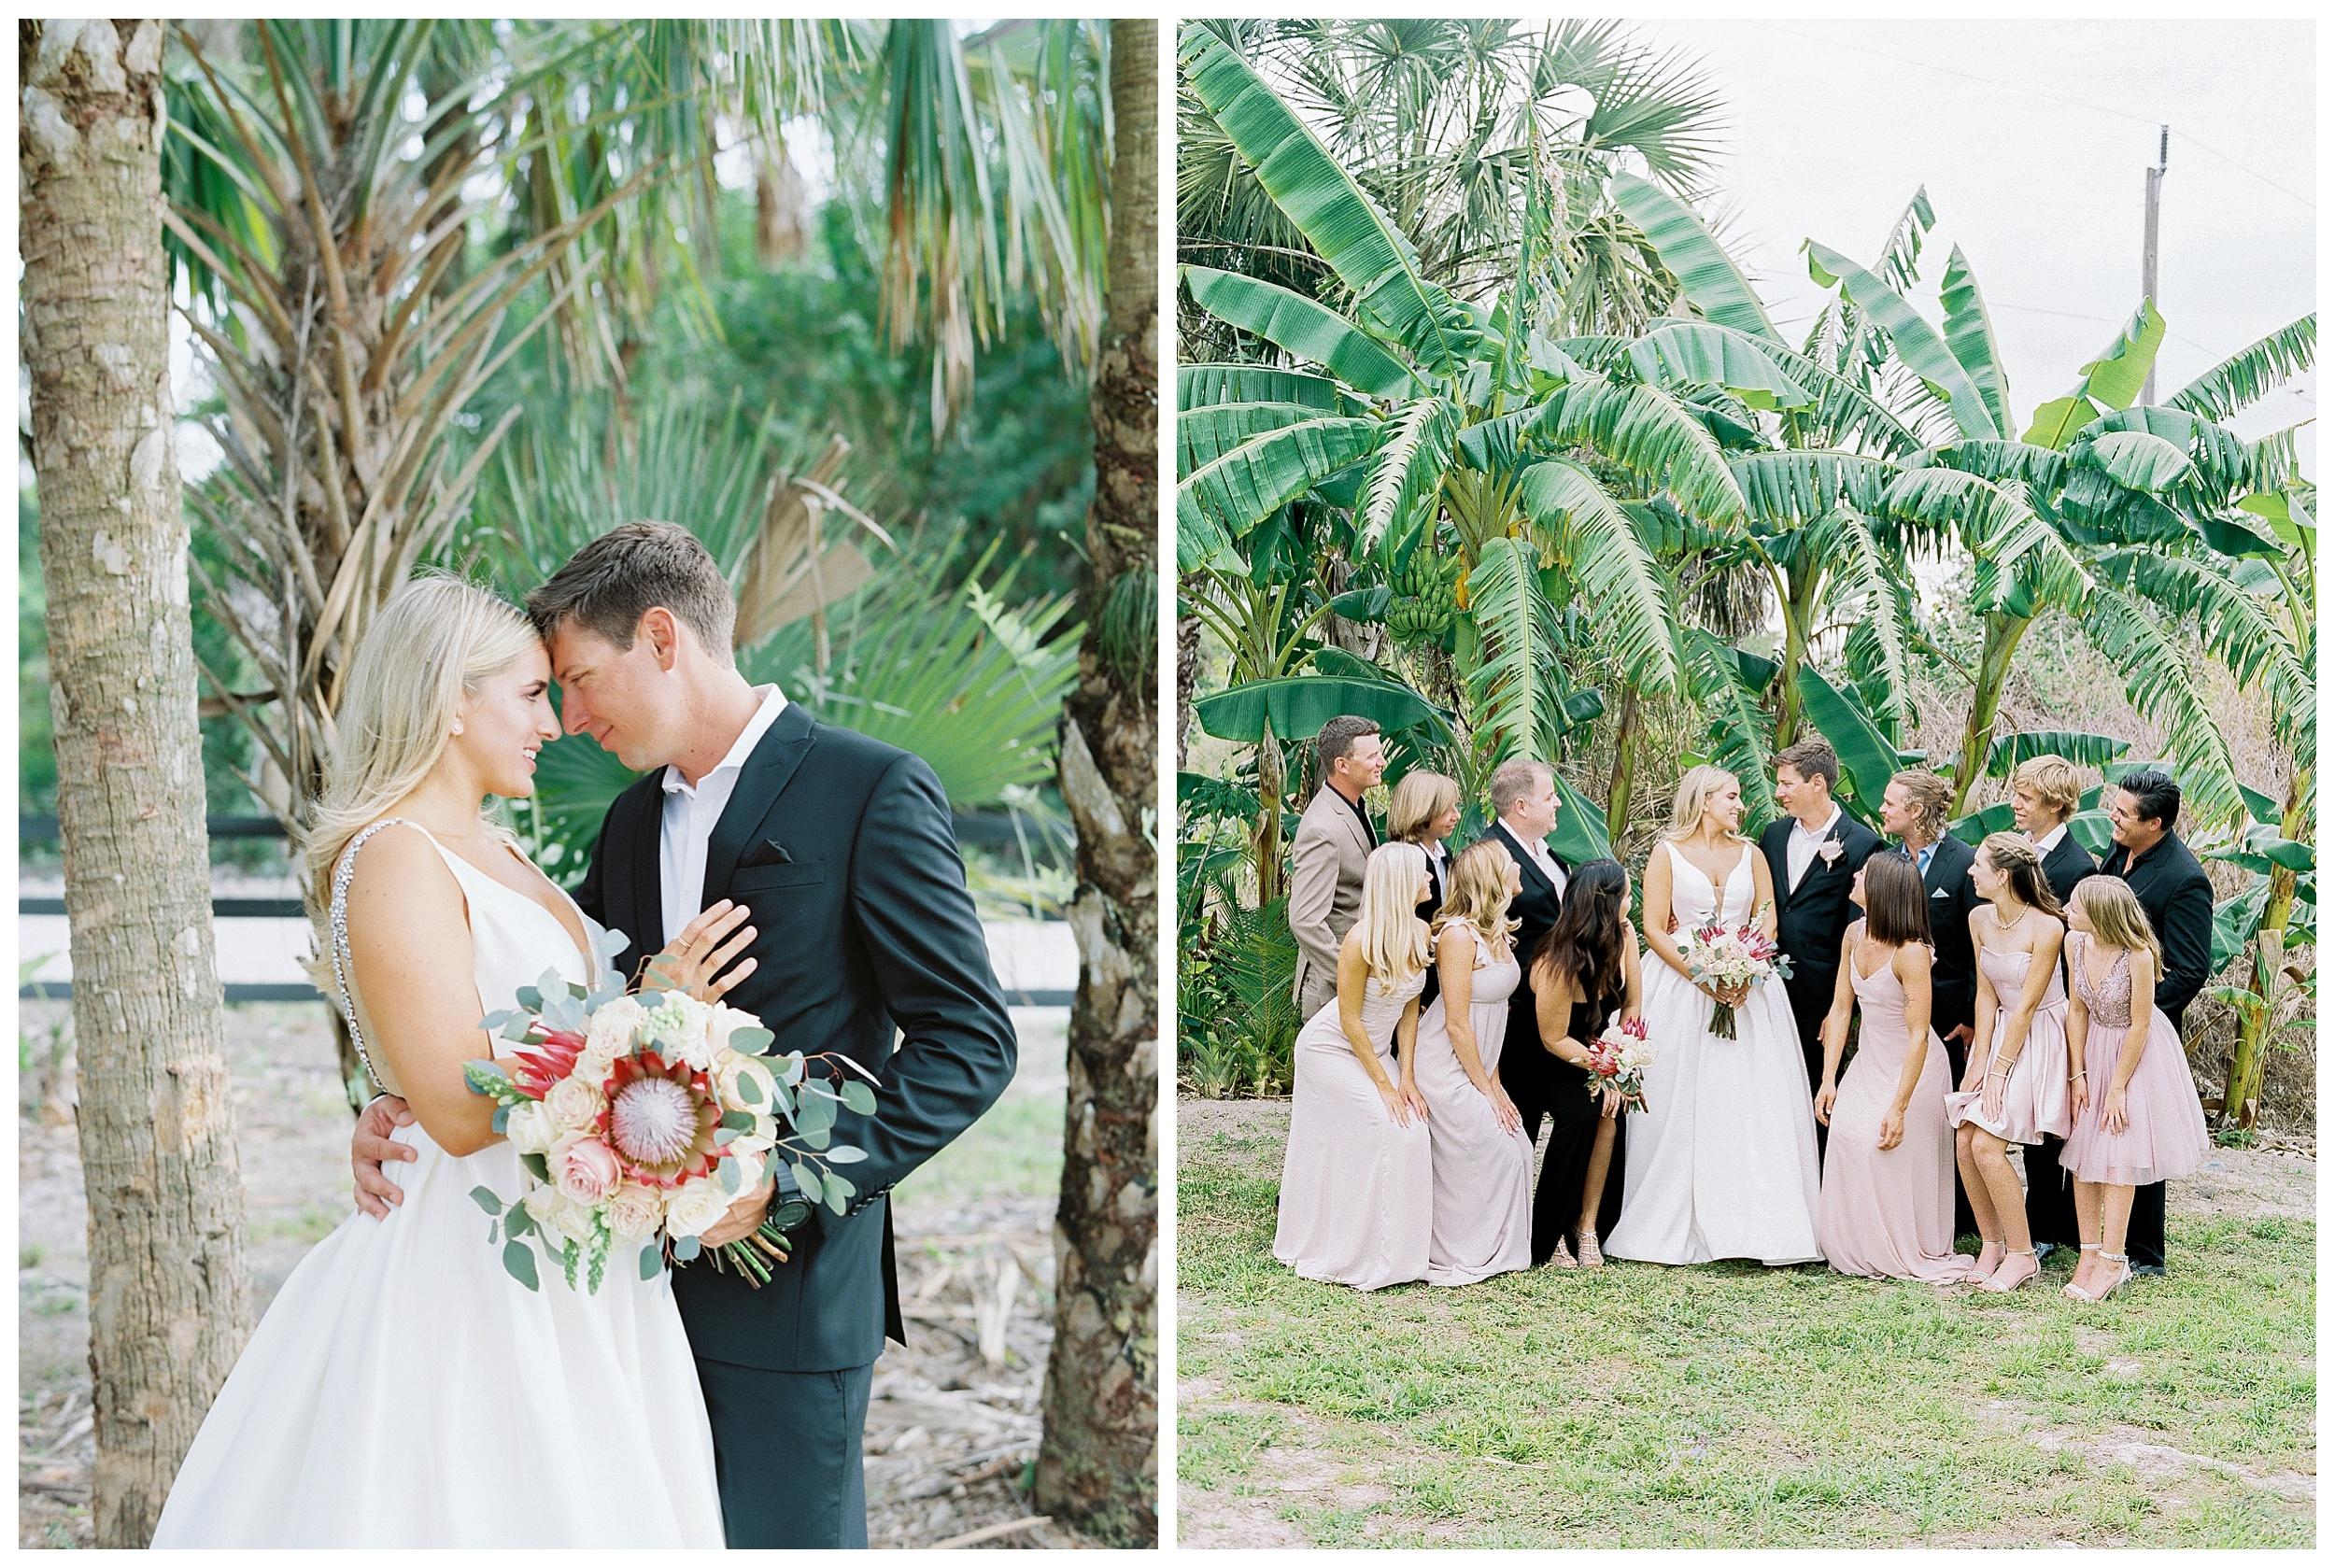 South Florida Wedding Photographer Kir Tuben_0053.jpg